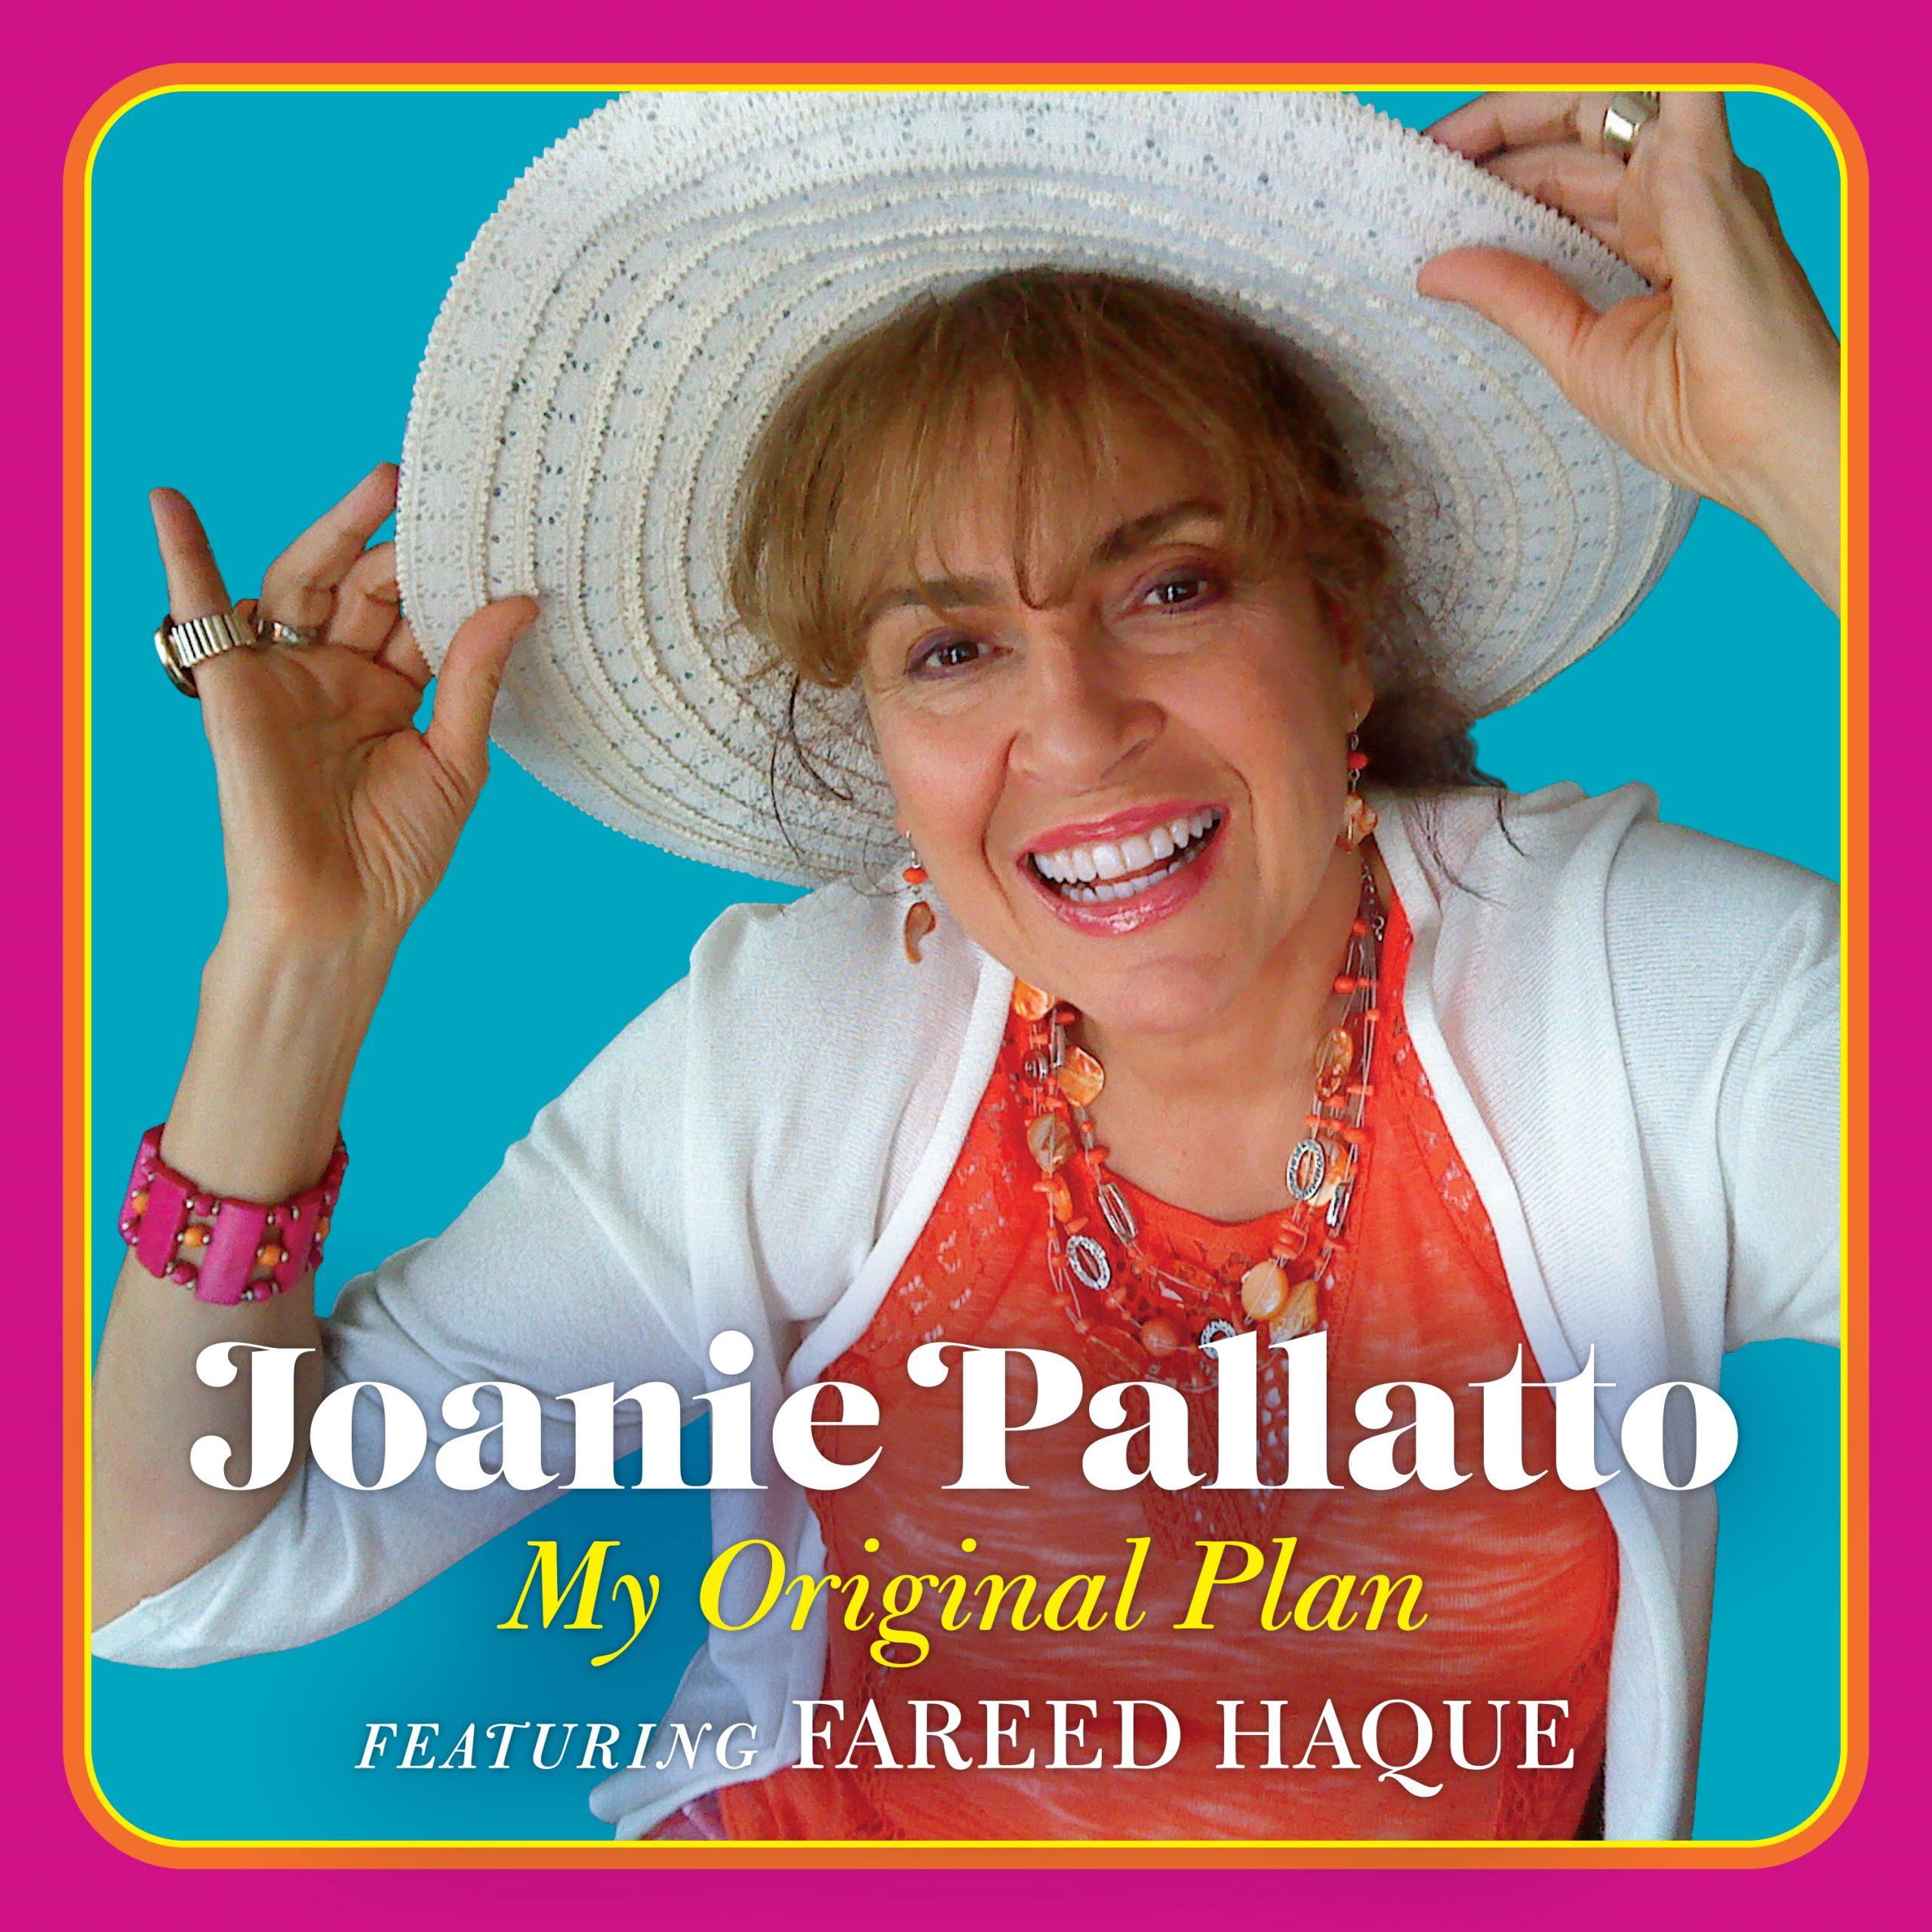 Joanie Pallatto: My Original Plan